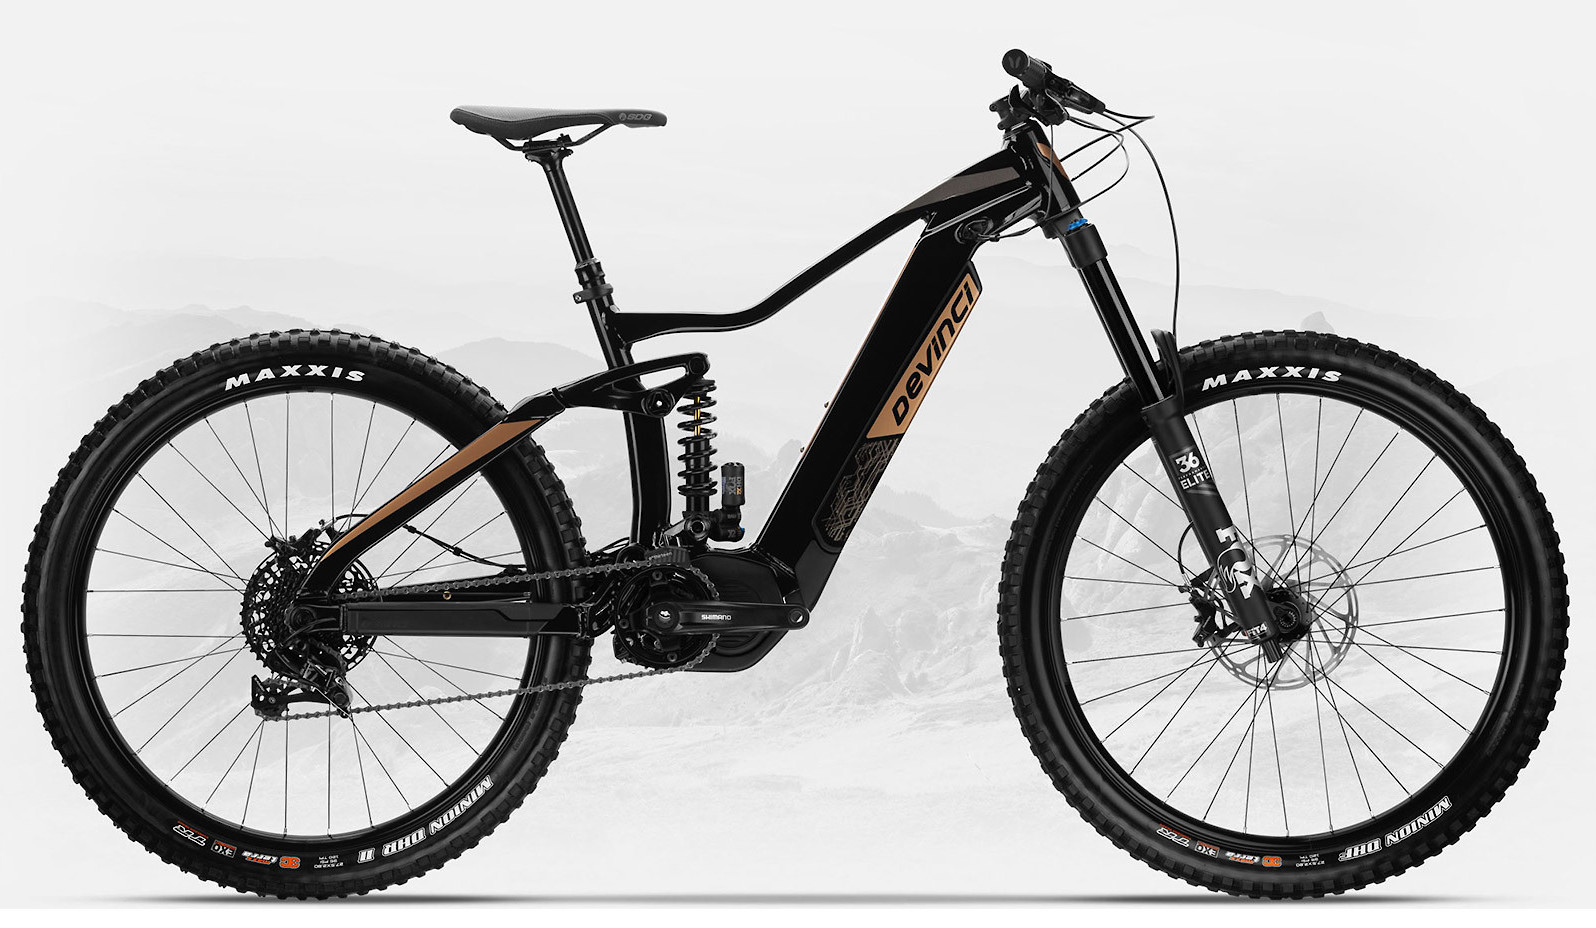 2019 Devinci AC NX/GX E-Bike